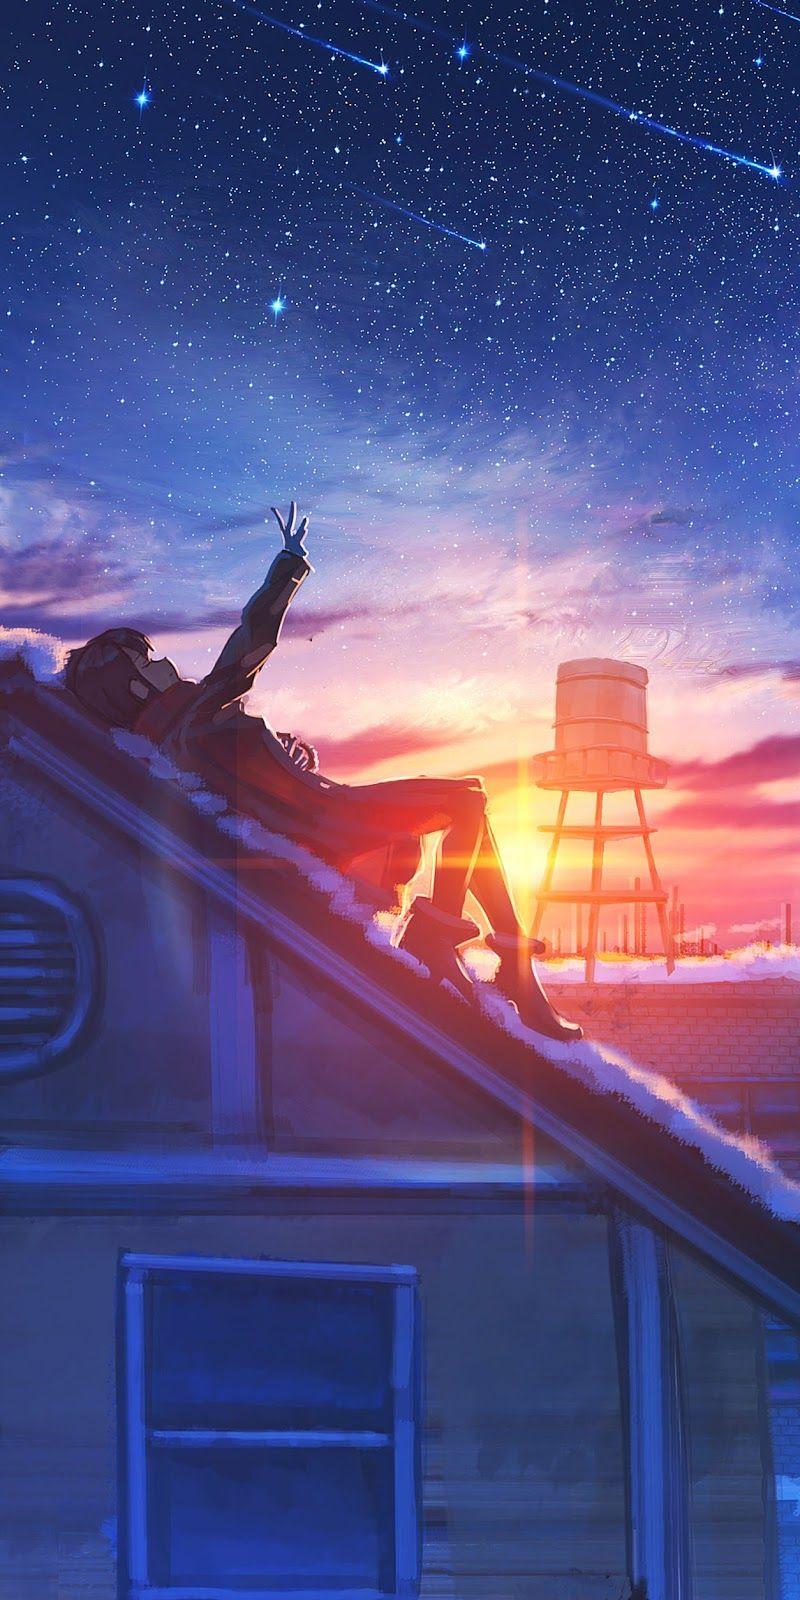 Watching The Sunset Anime Scenery Wallpaper Disney Art Of Animation Art Of Animation Resort